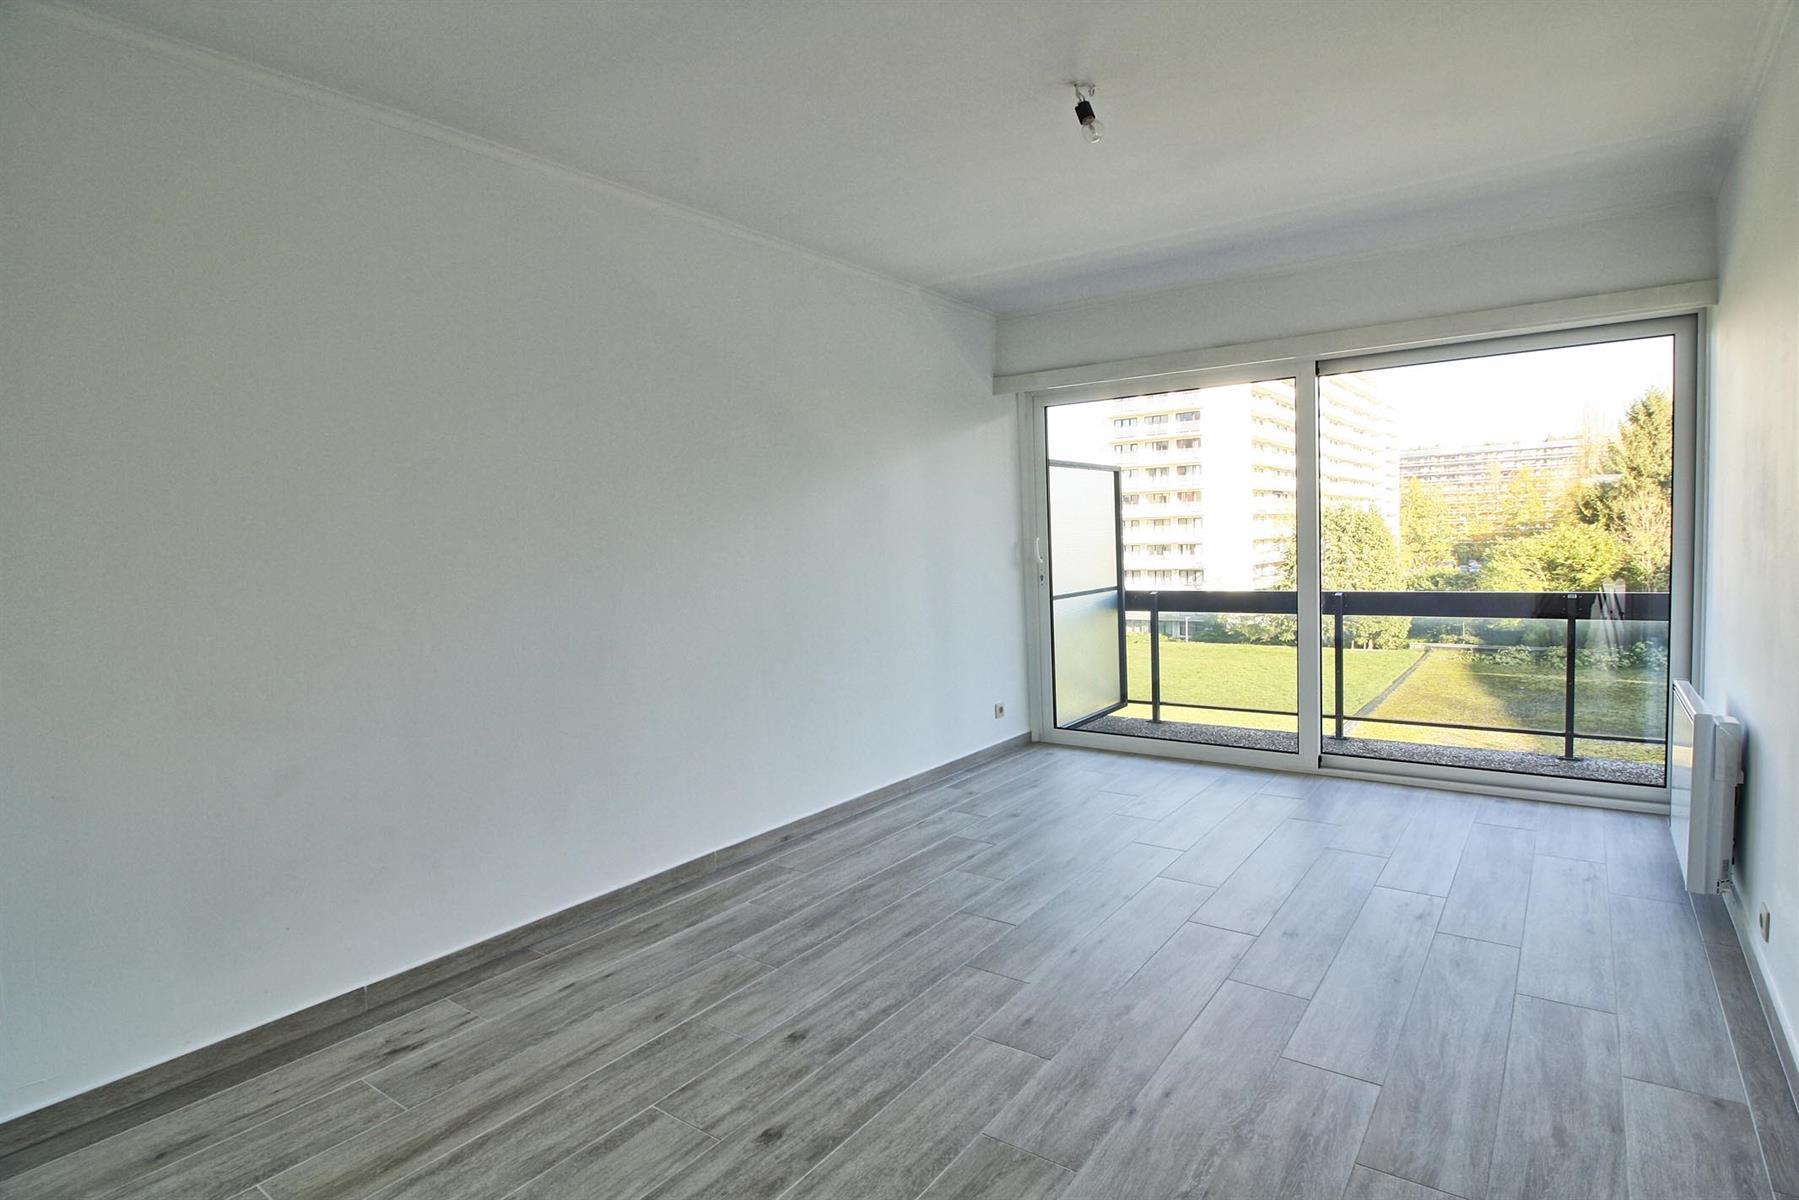 Appartement - Woluwe-Saint-Lambert - #4237926-7